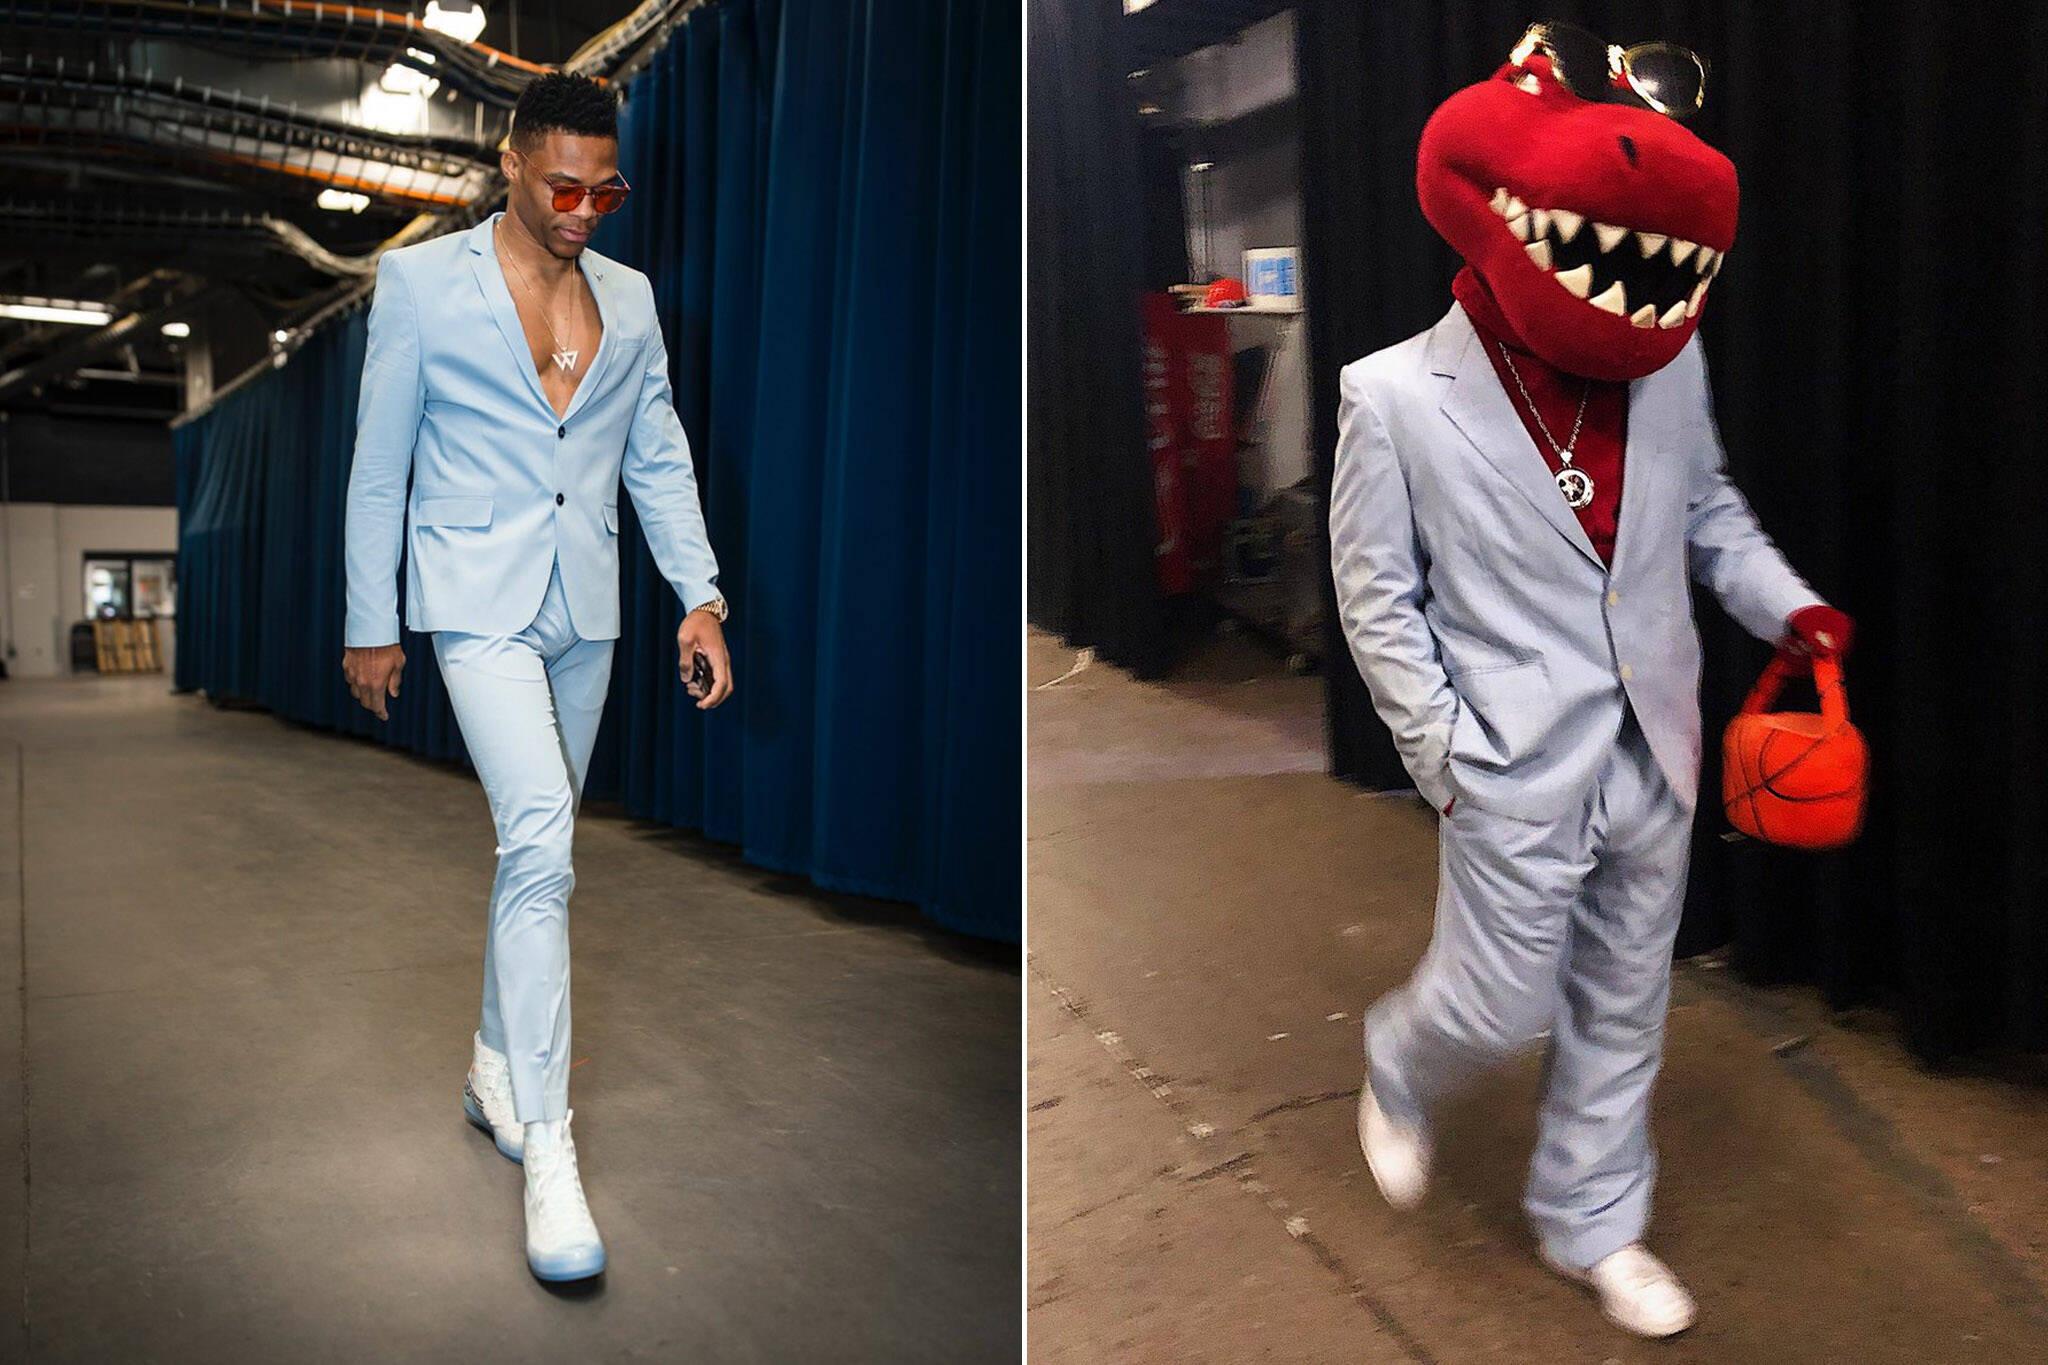 Westbrook Raptor suit